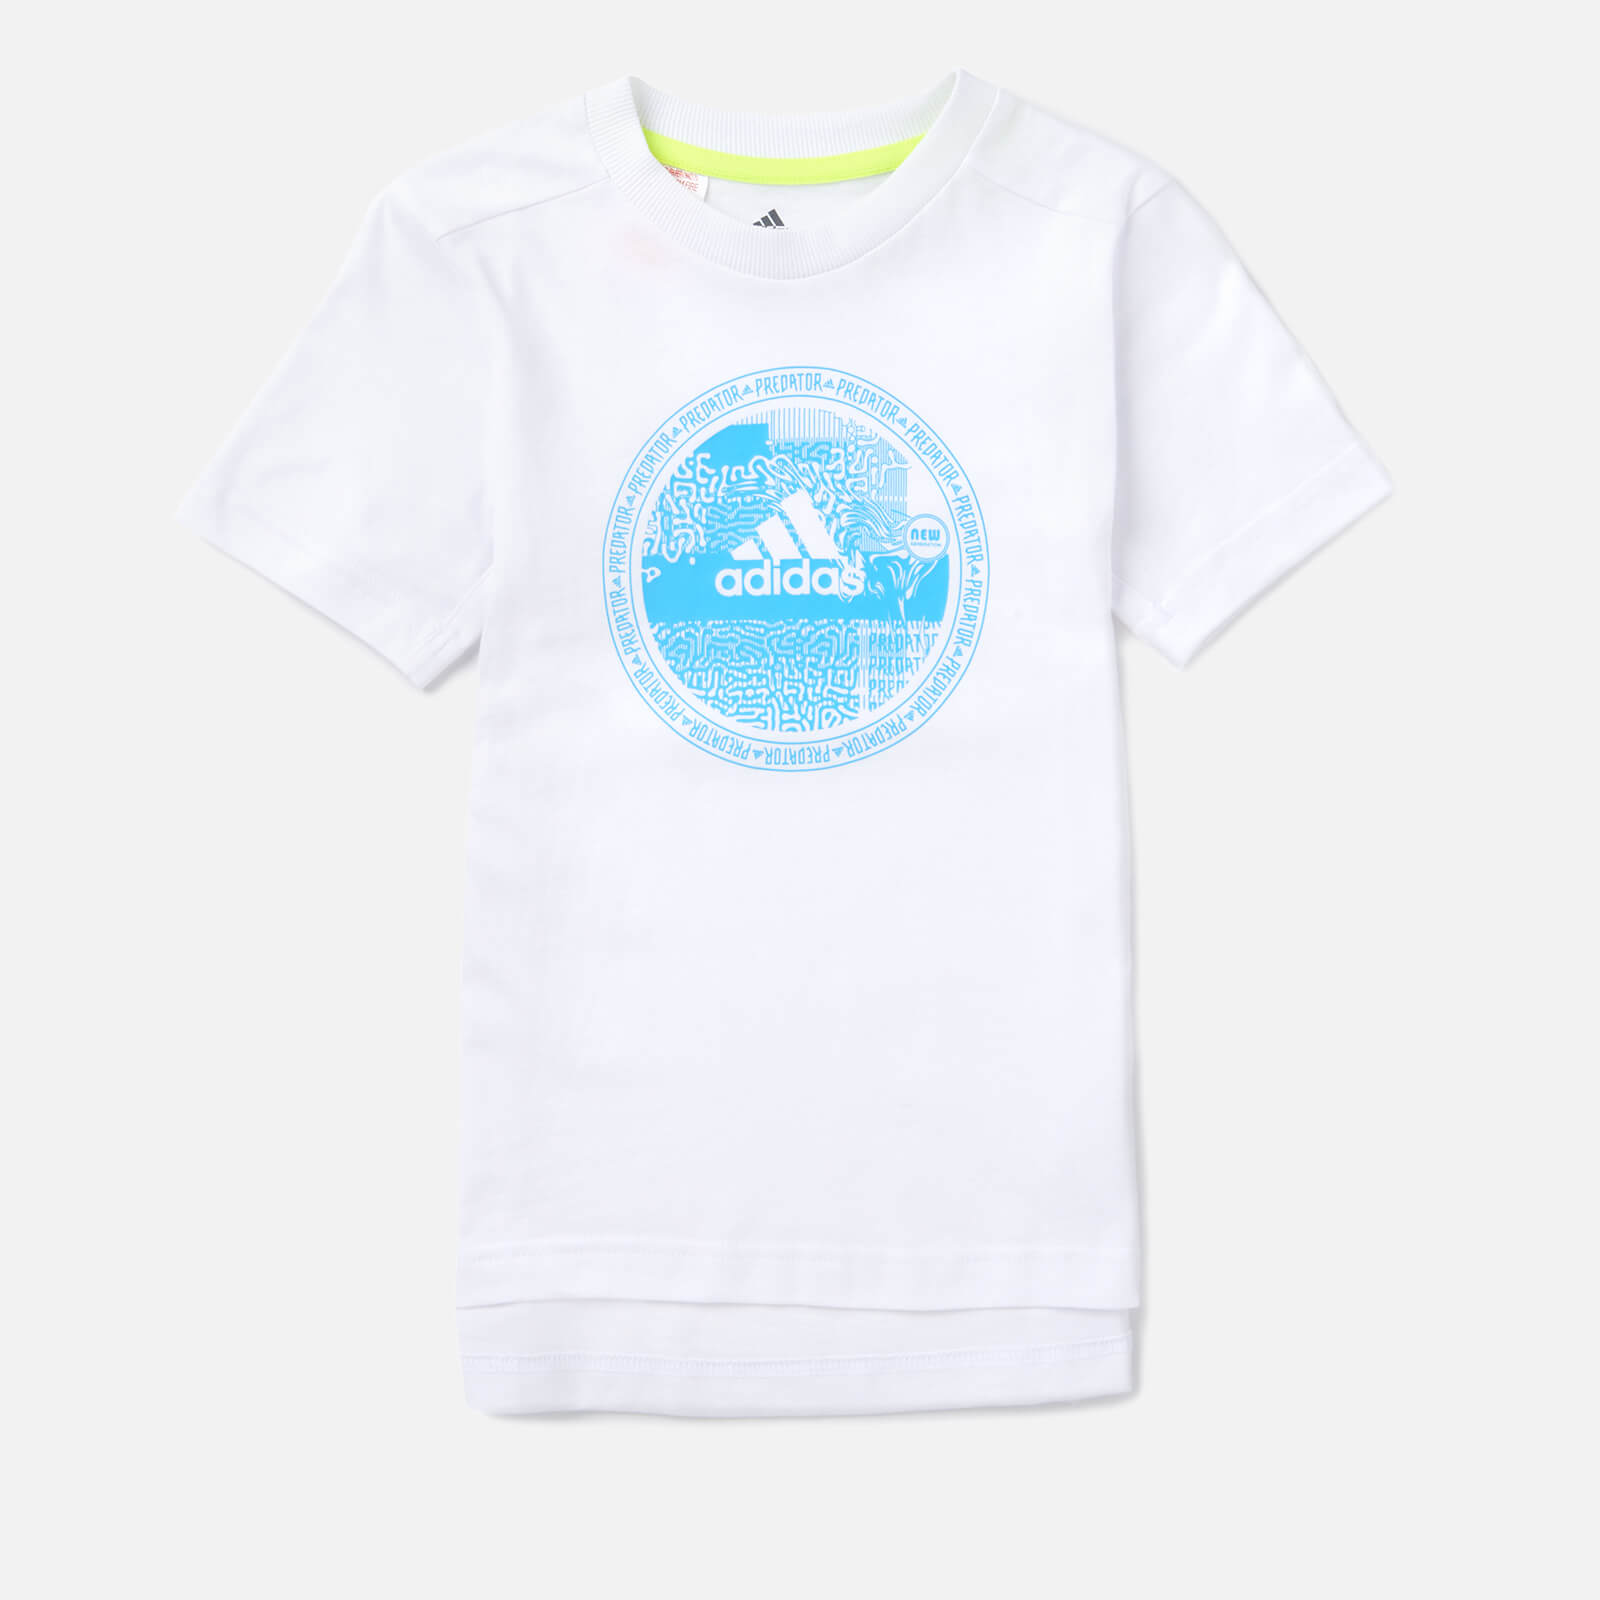 adidas Performance 257 Rise Up N Run Parley T shirt Print